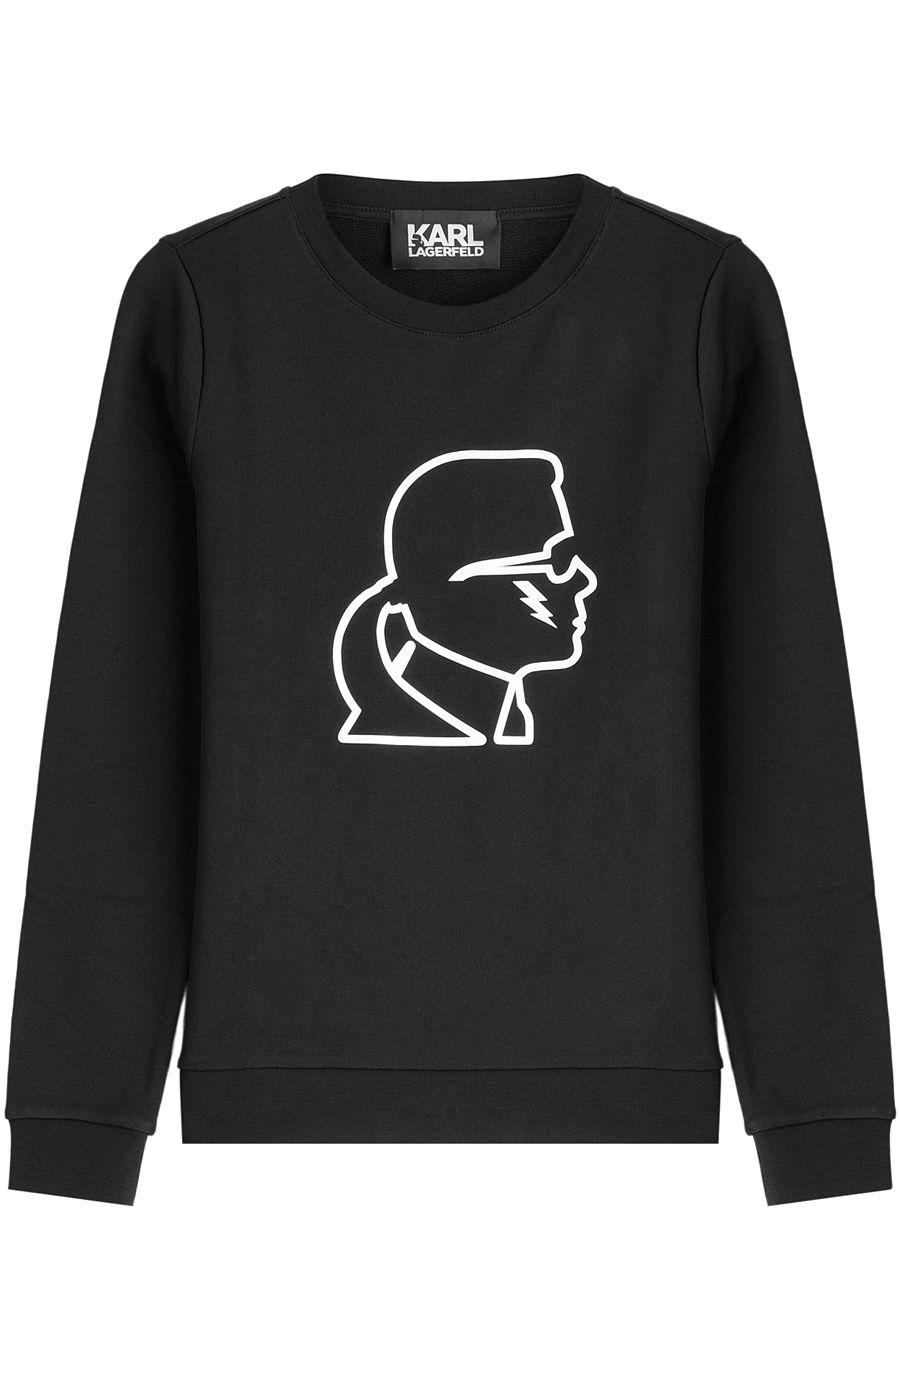 Karl Statement Sweatshirt Ropa Moda Color Favorito